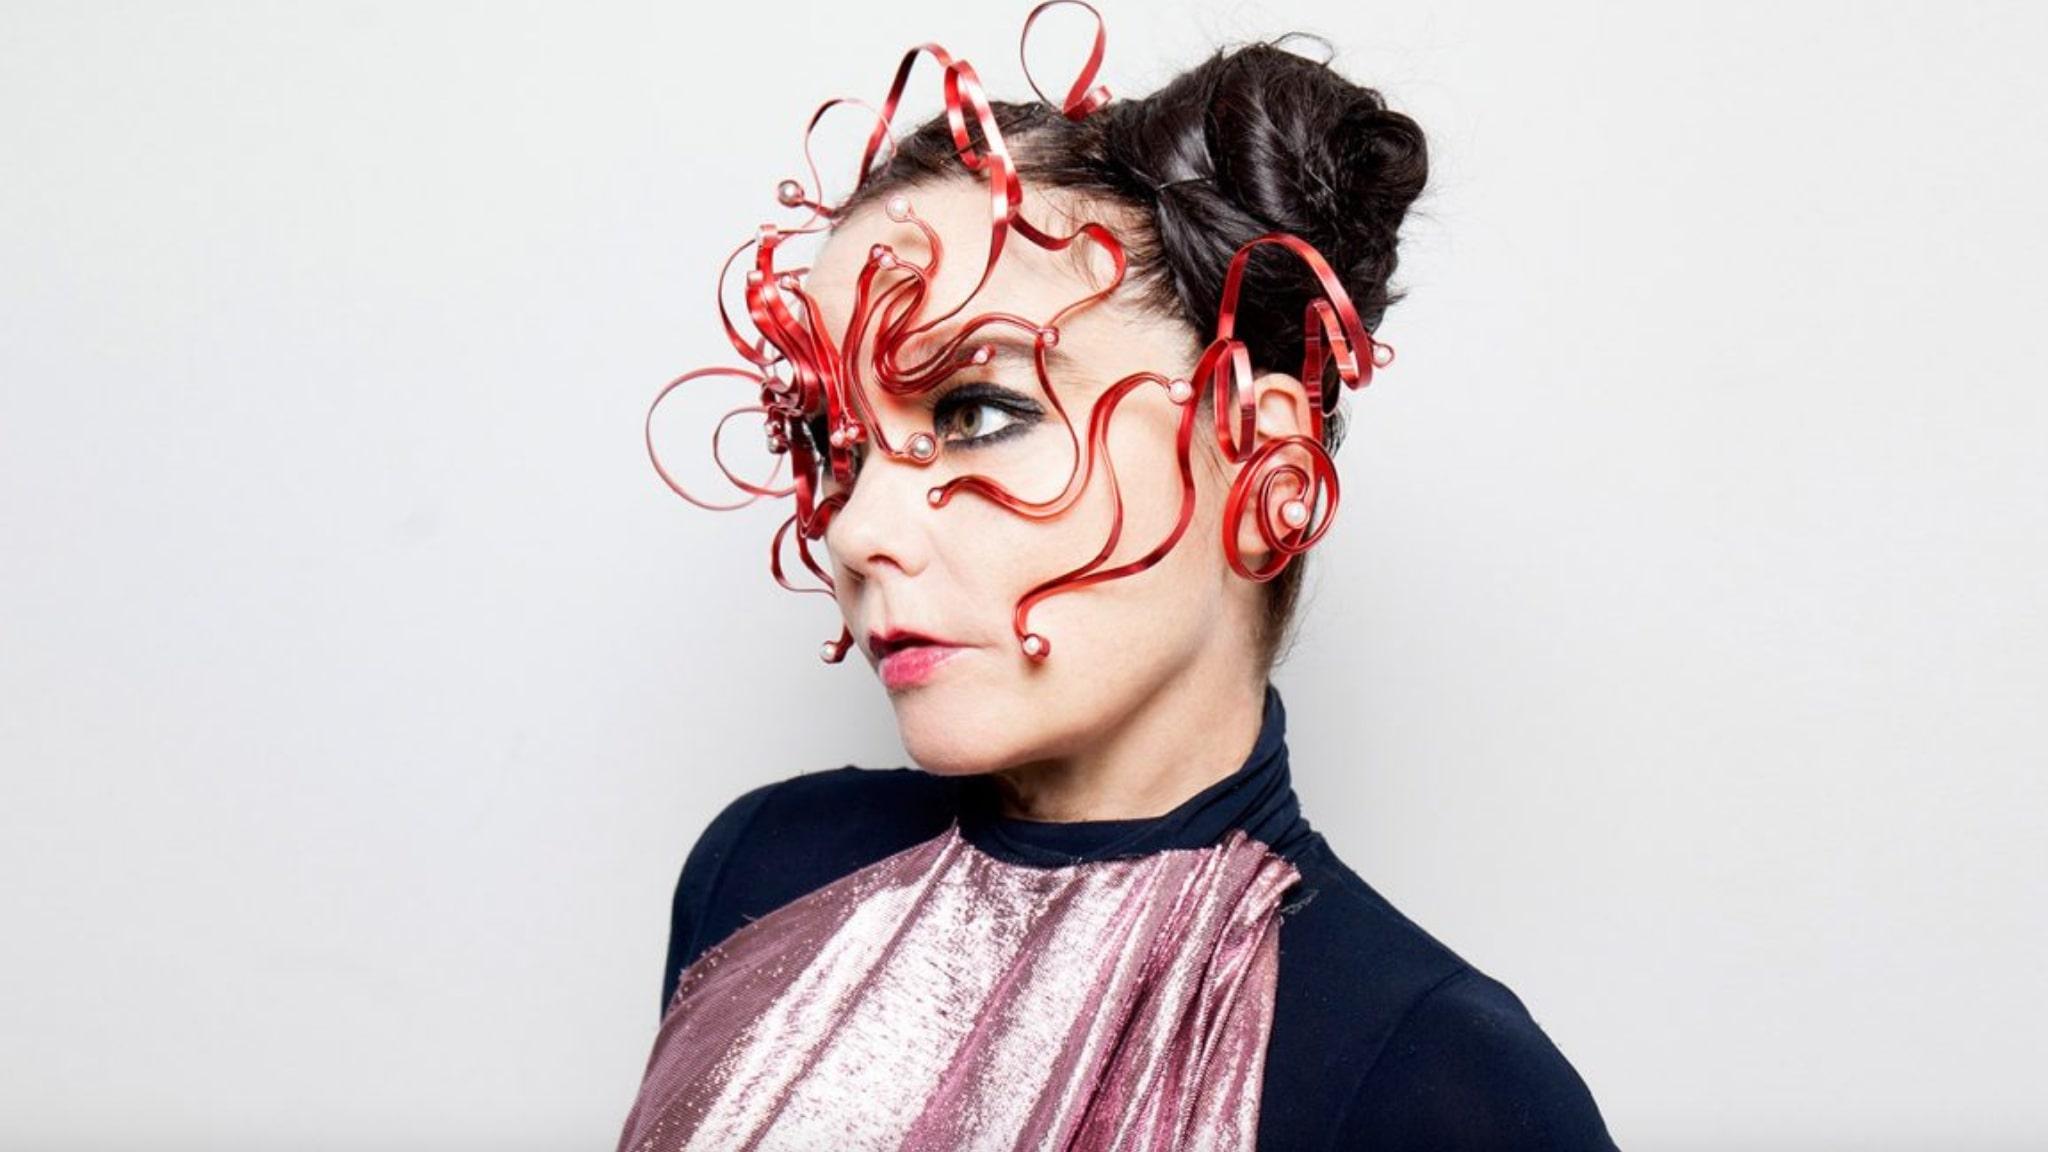 Björk to broadcast four orchestral concerts from Reykjavik image